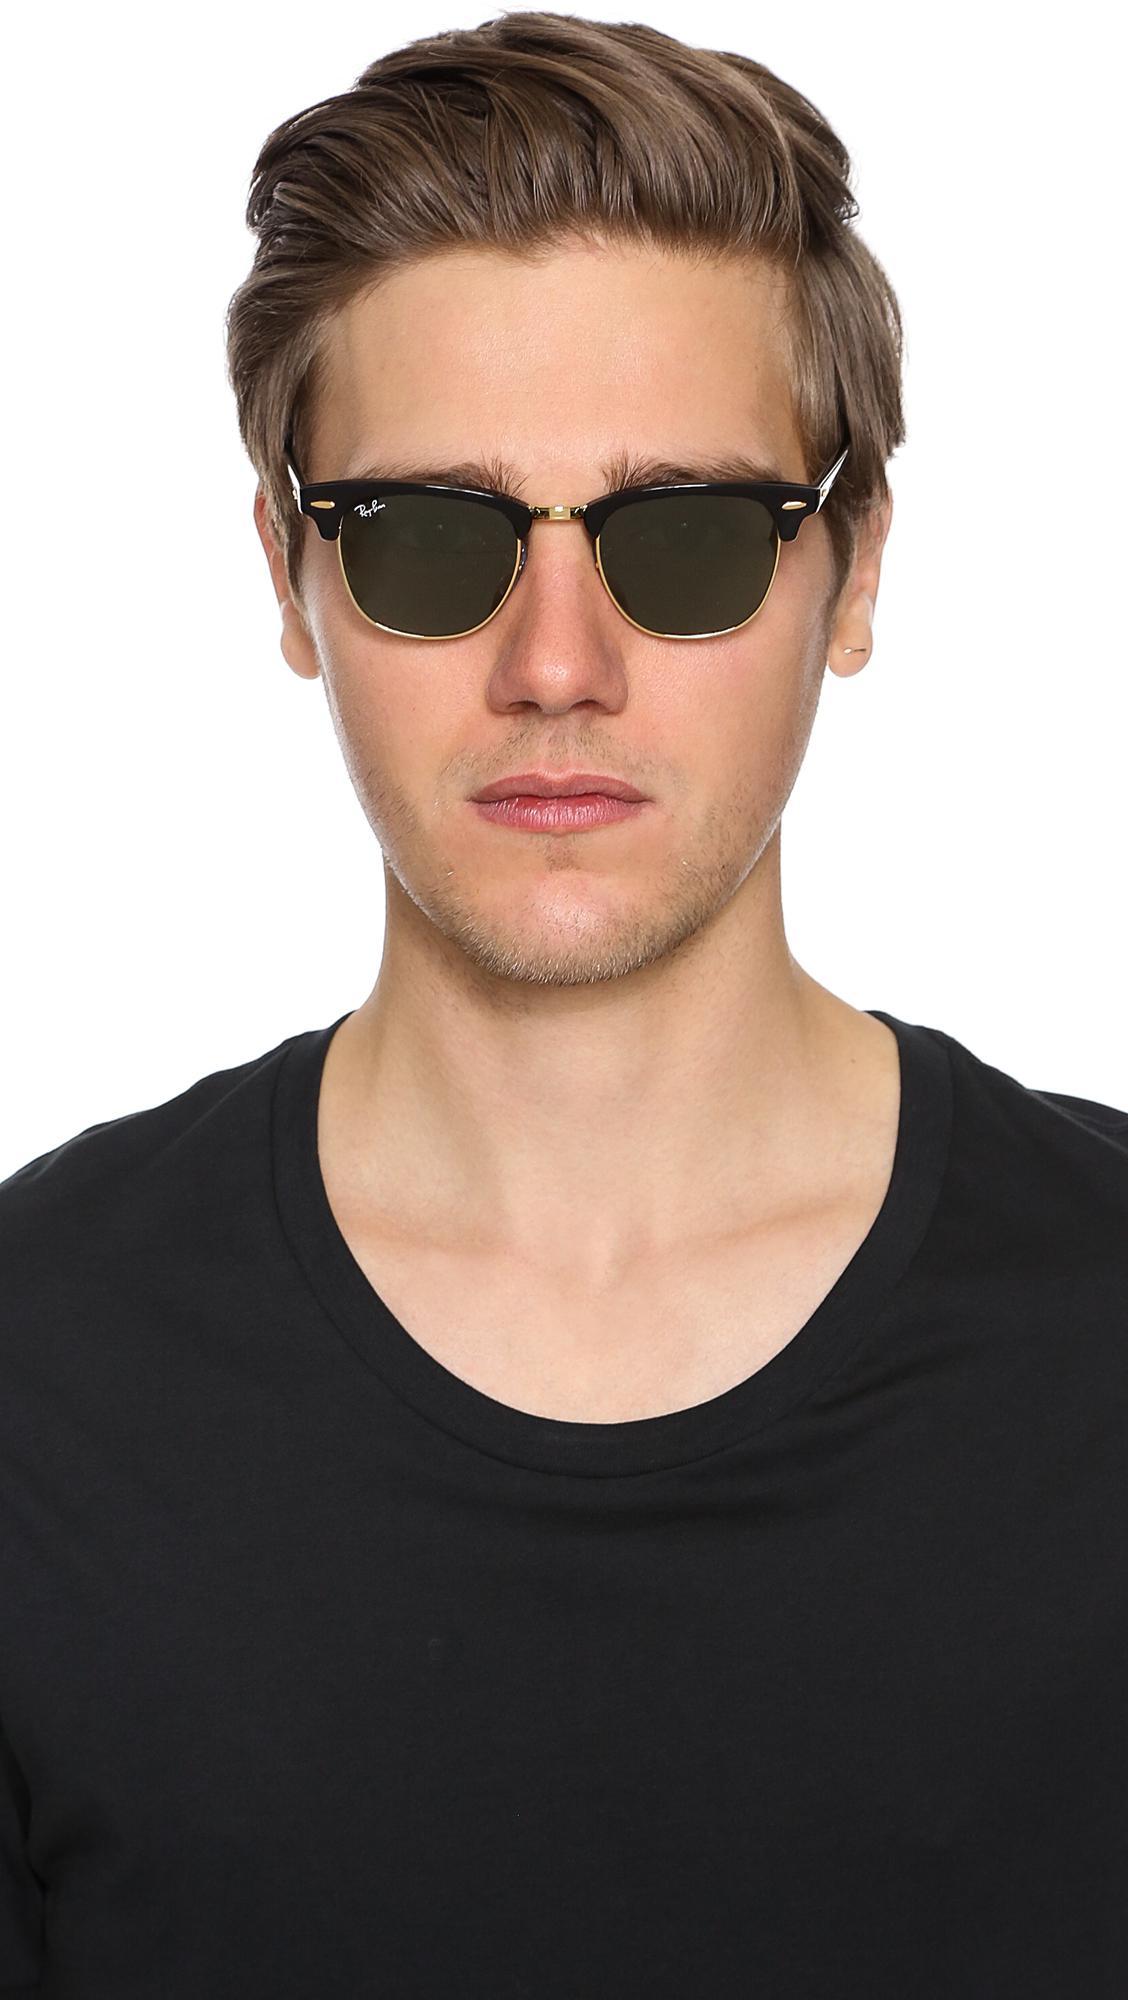 84ebc54656e Ray-Ban - Black Clubmaster Classic Sunglasses for Men - Lyst. View  fullscreen